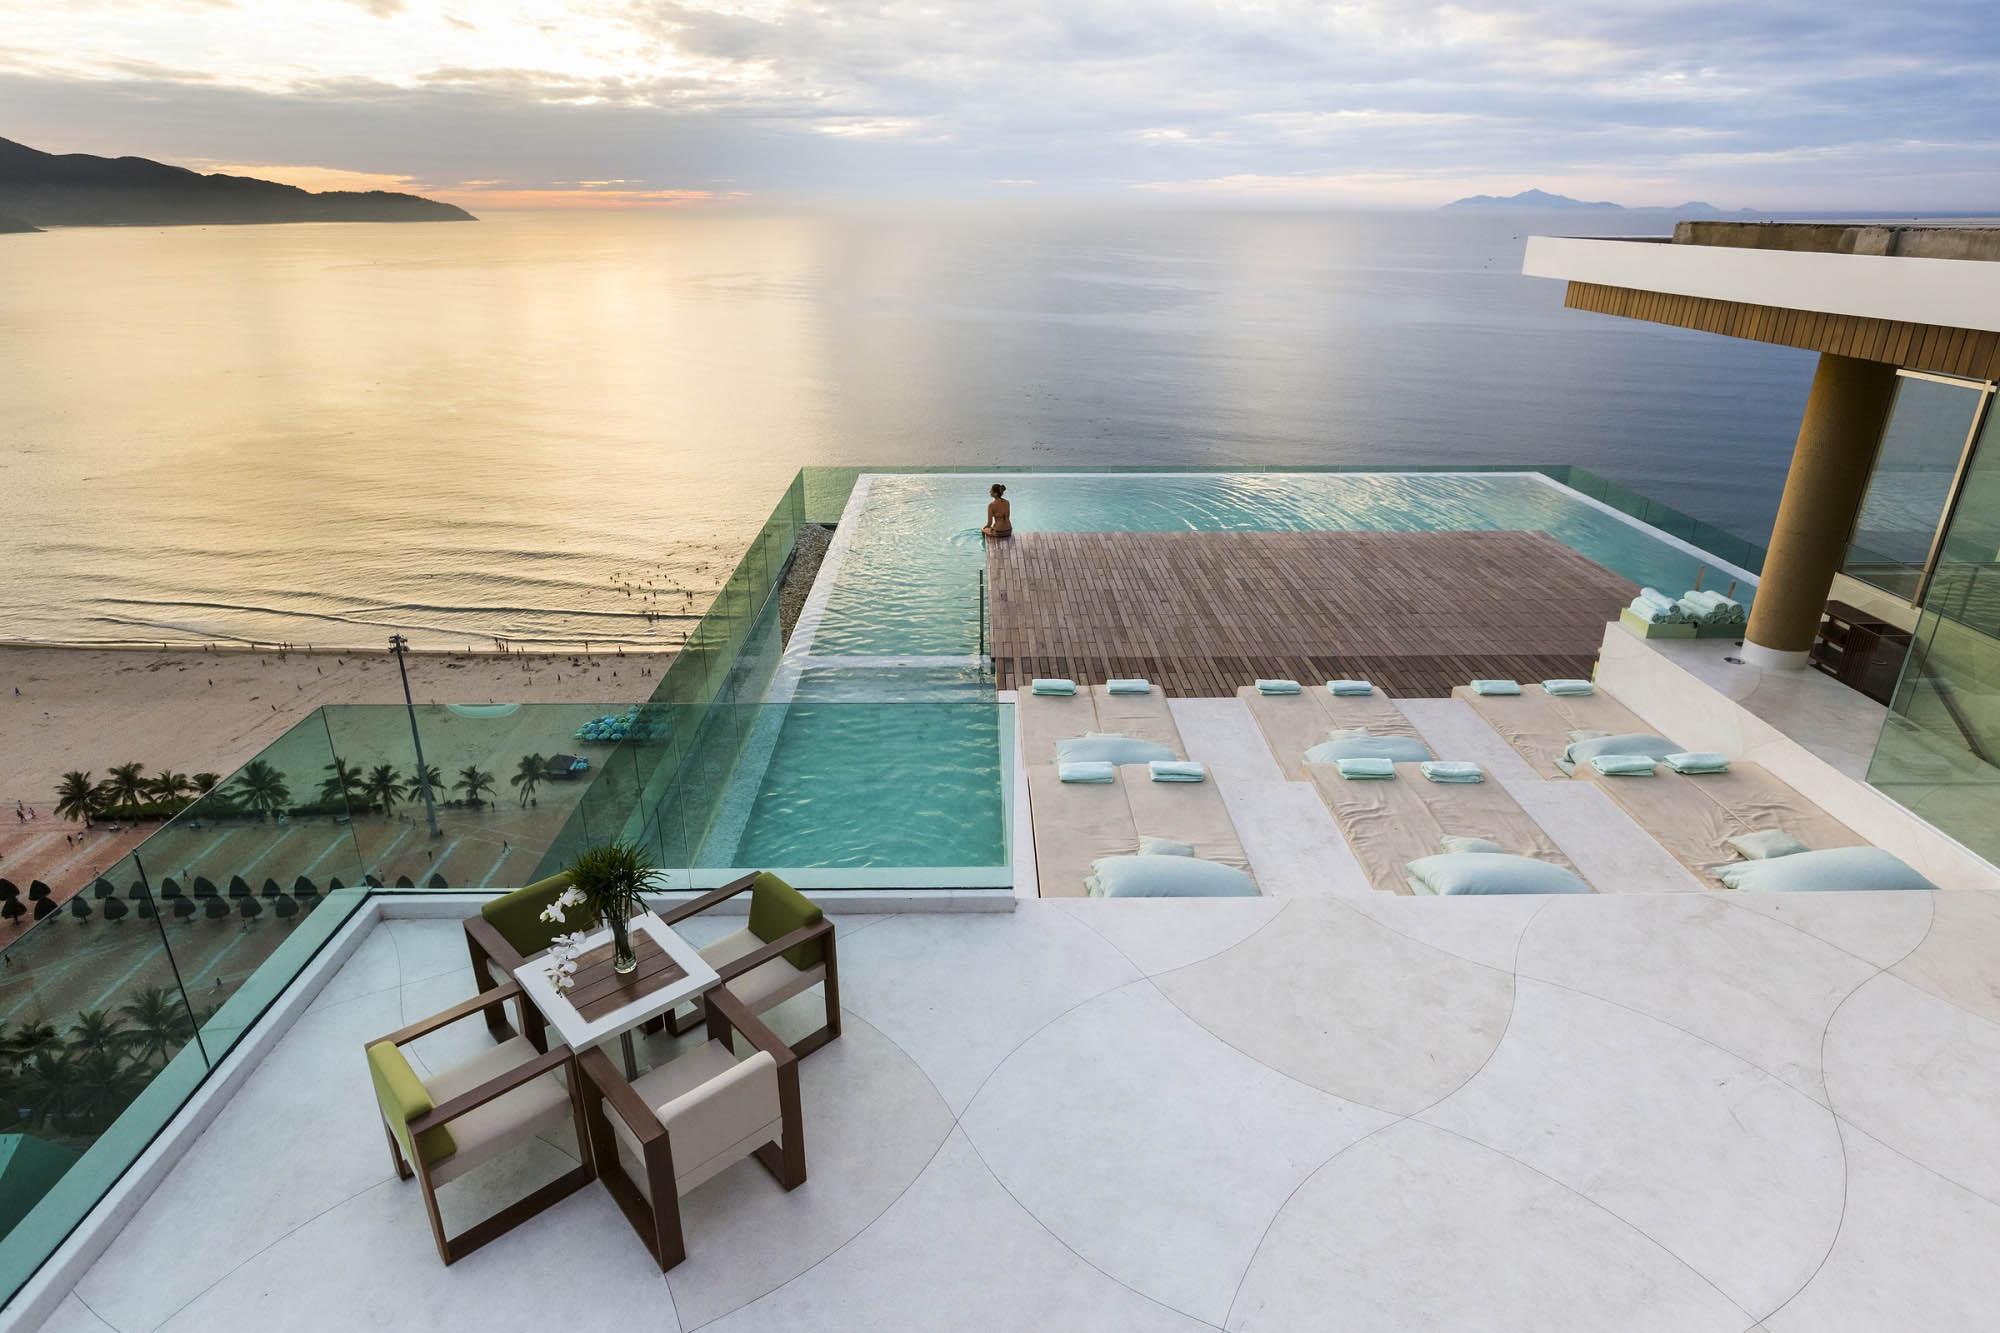 The Top Bar A La Carte Danang Beach Hotel 200 Vo Nguyen Giap Danang Fantasticity Com 01